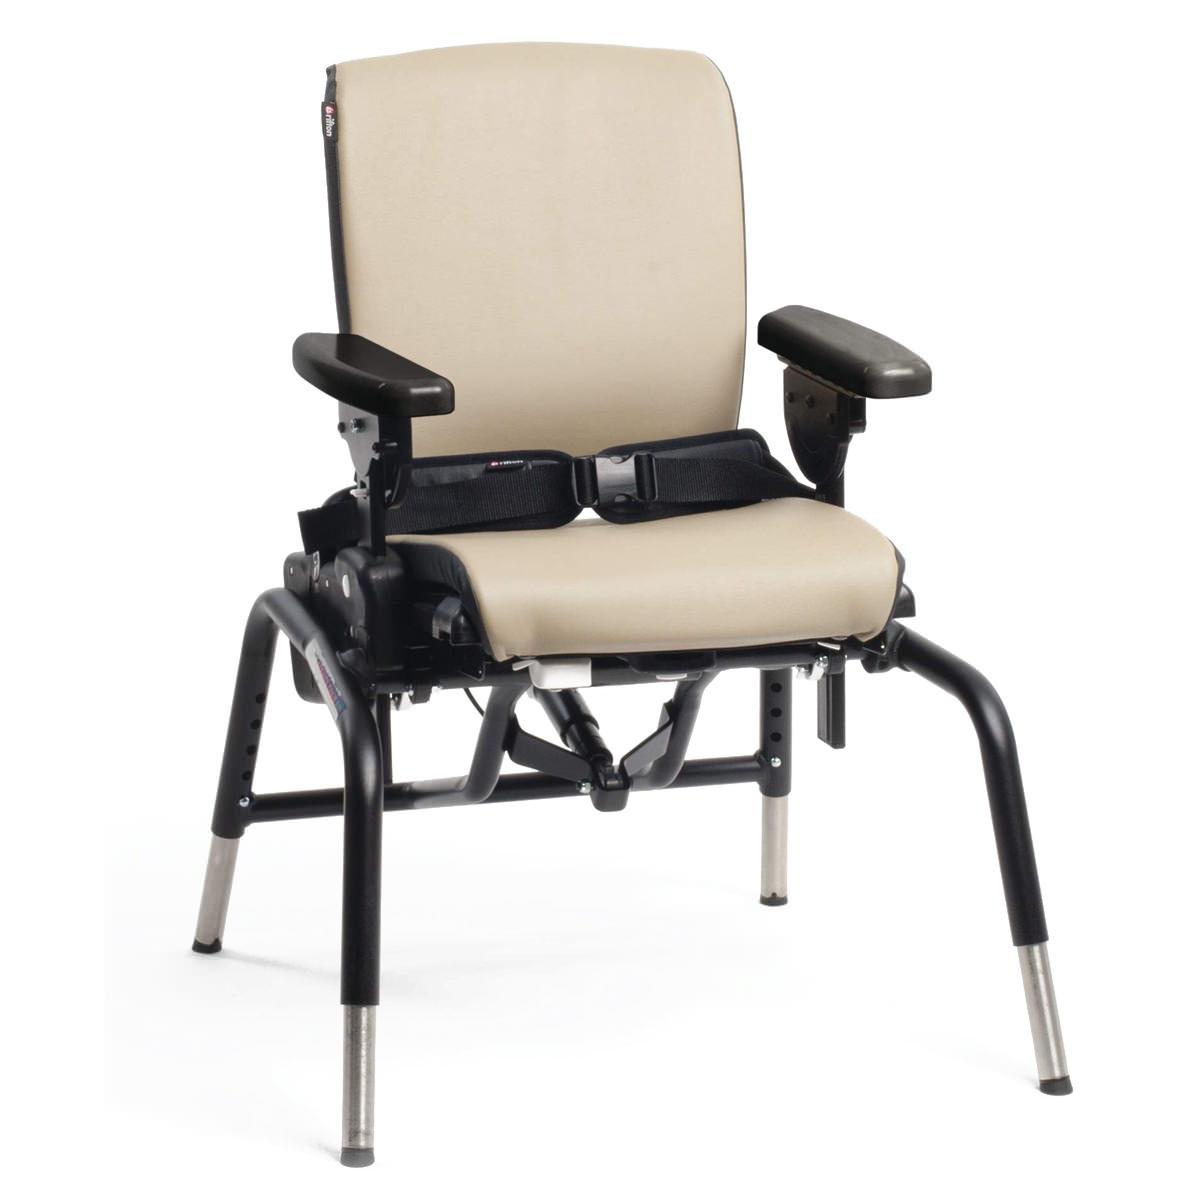 Rifton activity chair with standard base - Medium